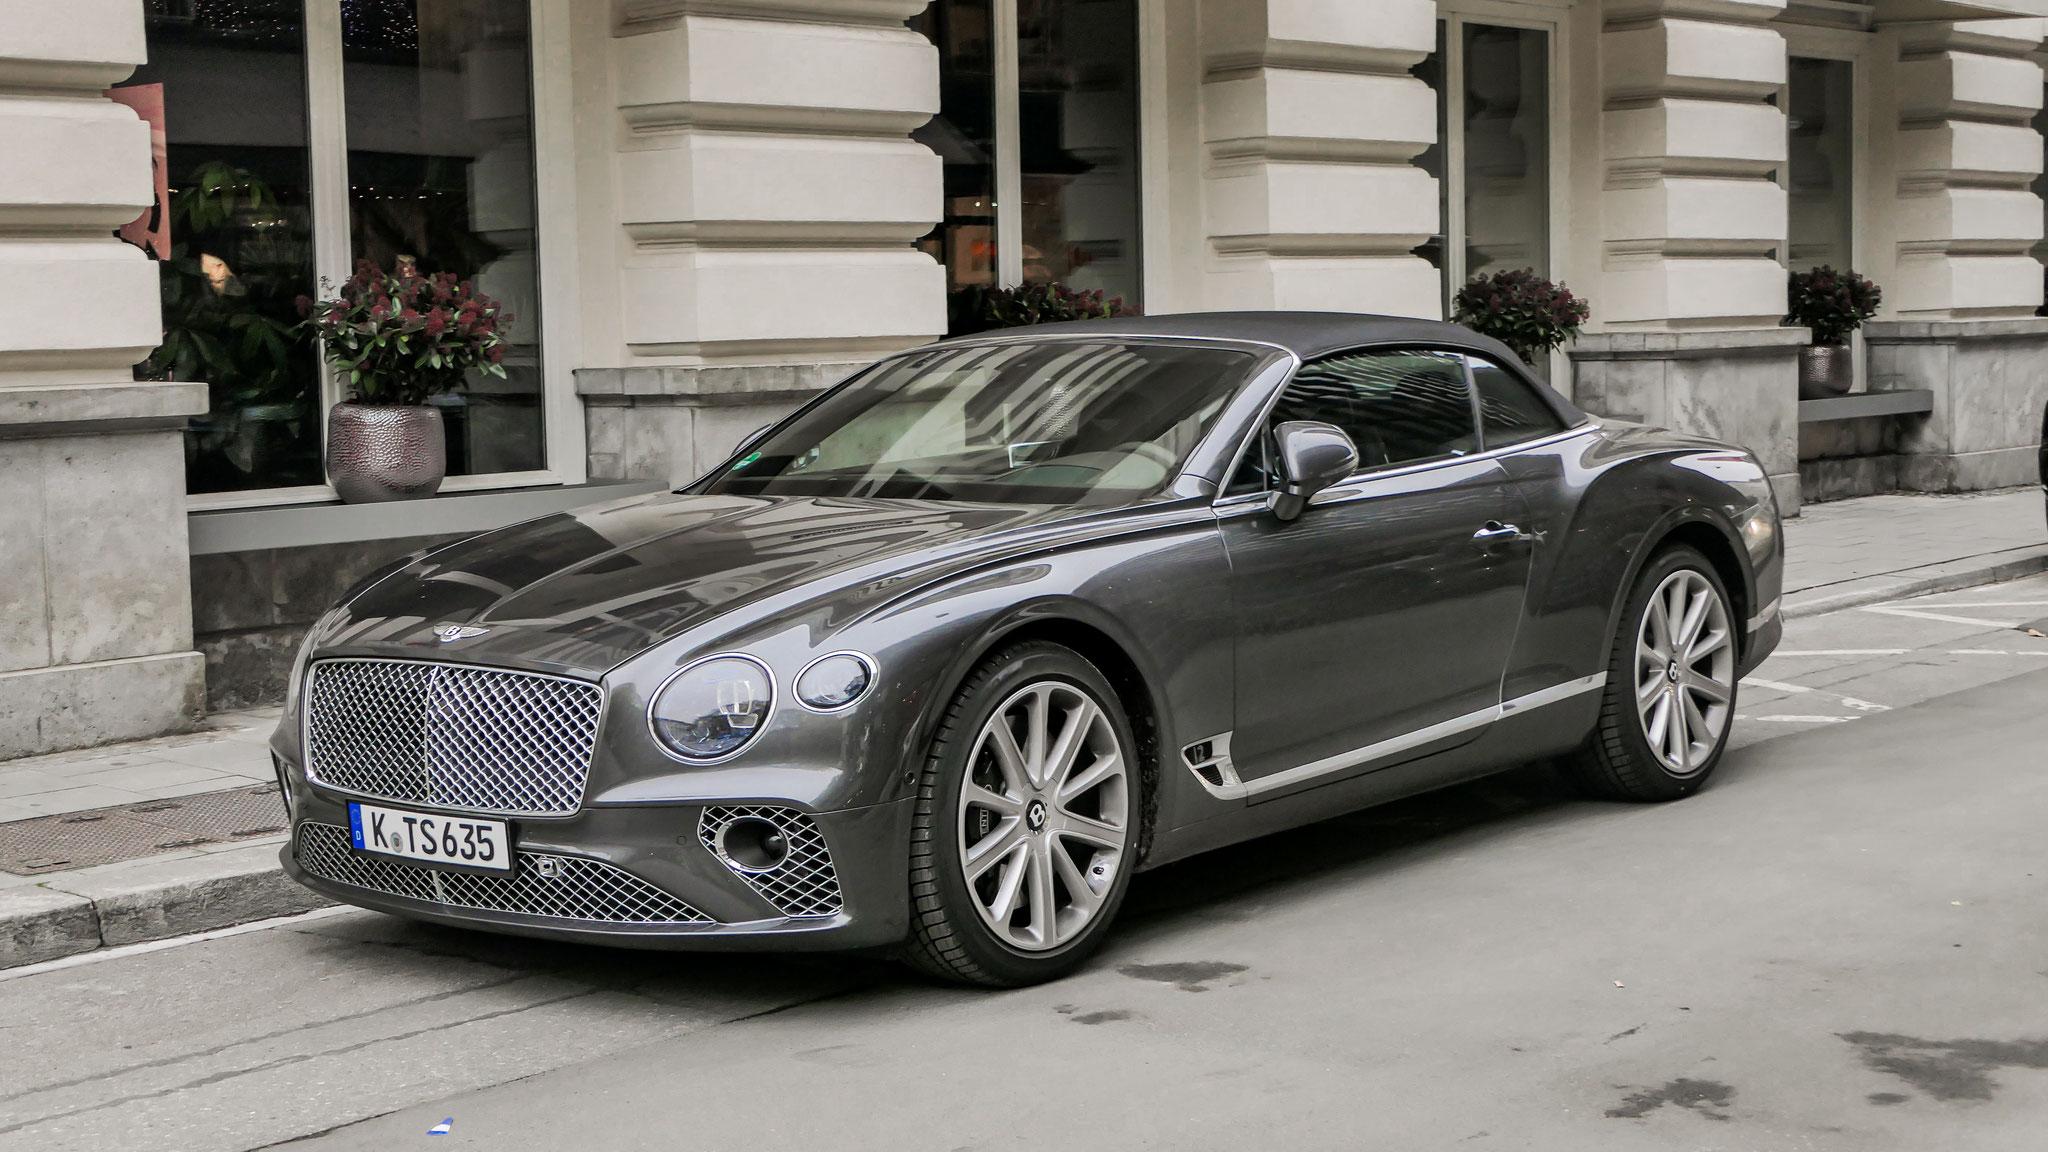 Bentley Continental GTC - K-TS-635